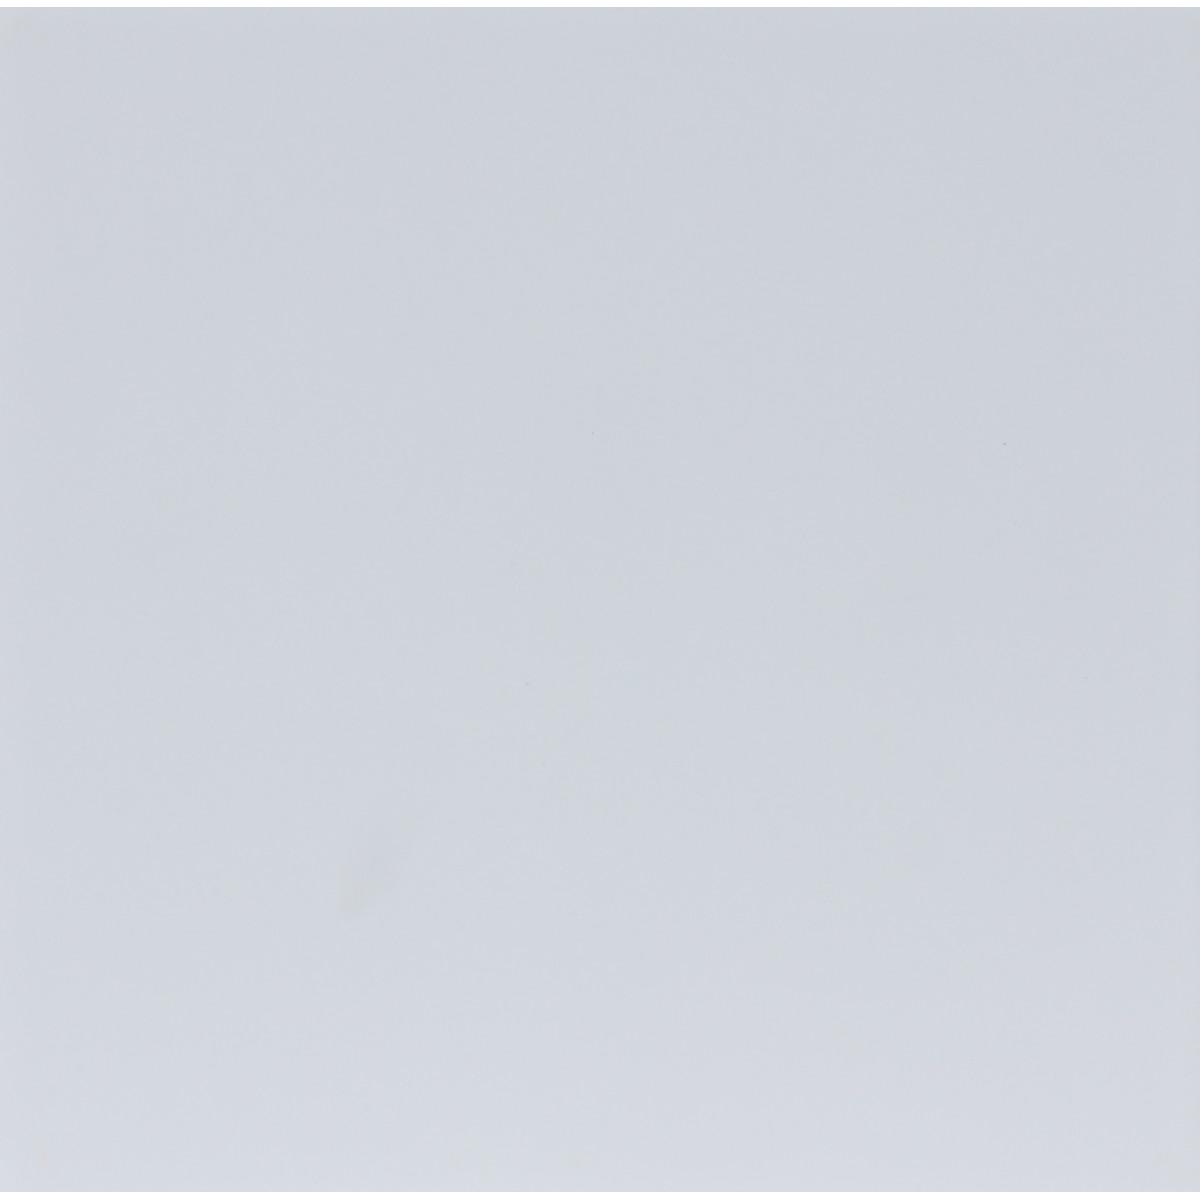 Плитка настенная Мемо Белый дым 20x20 см 0.8 м² цвет белый